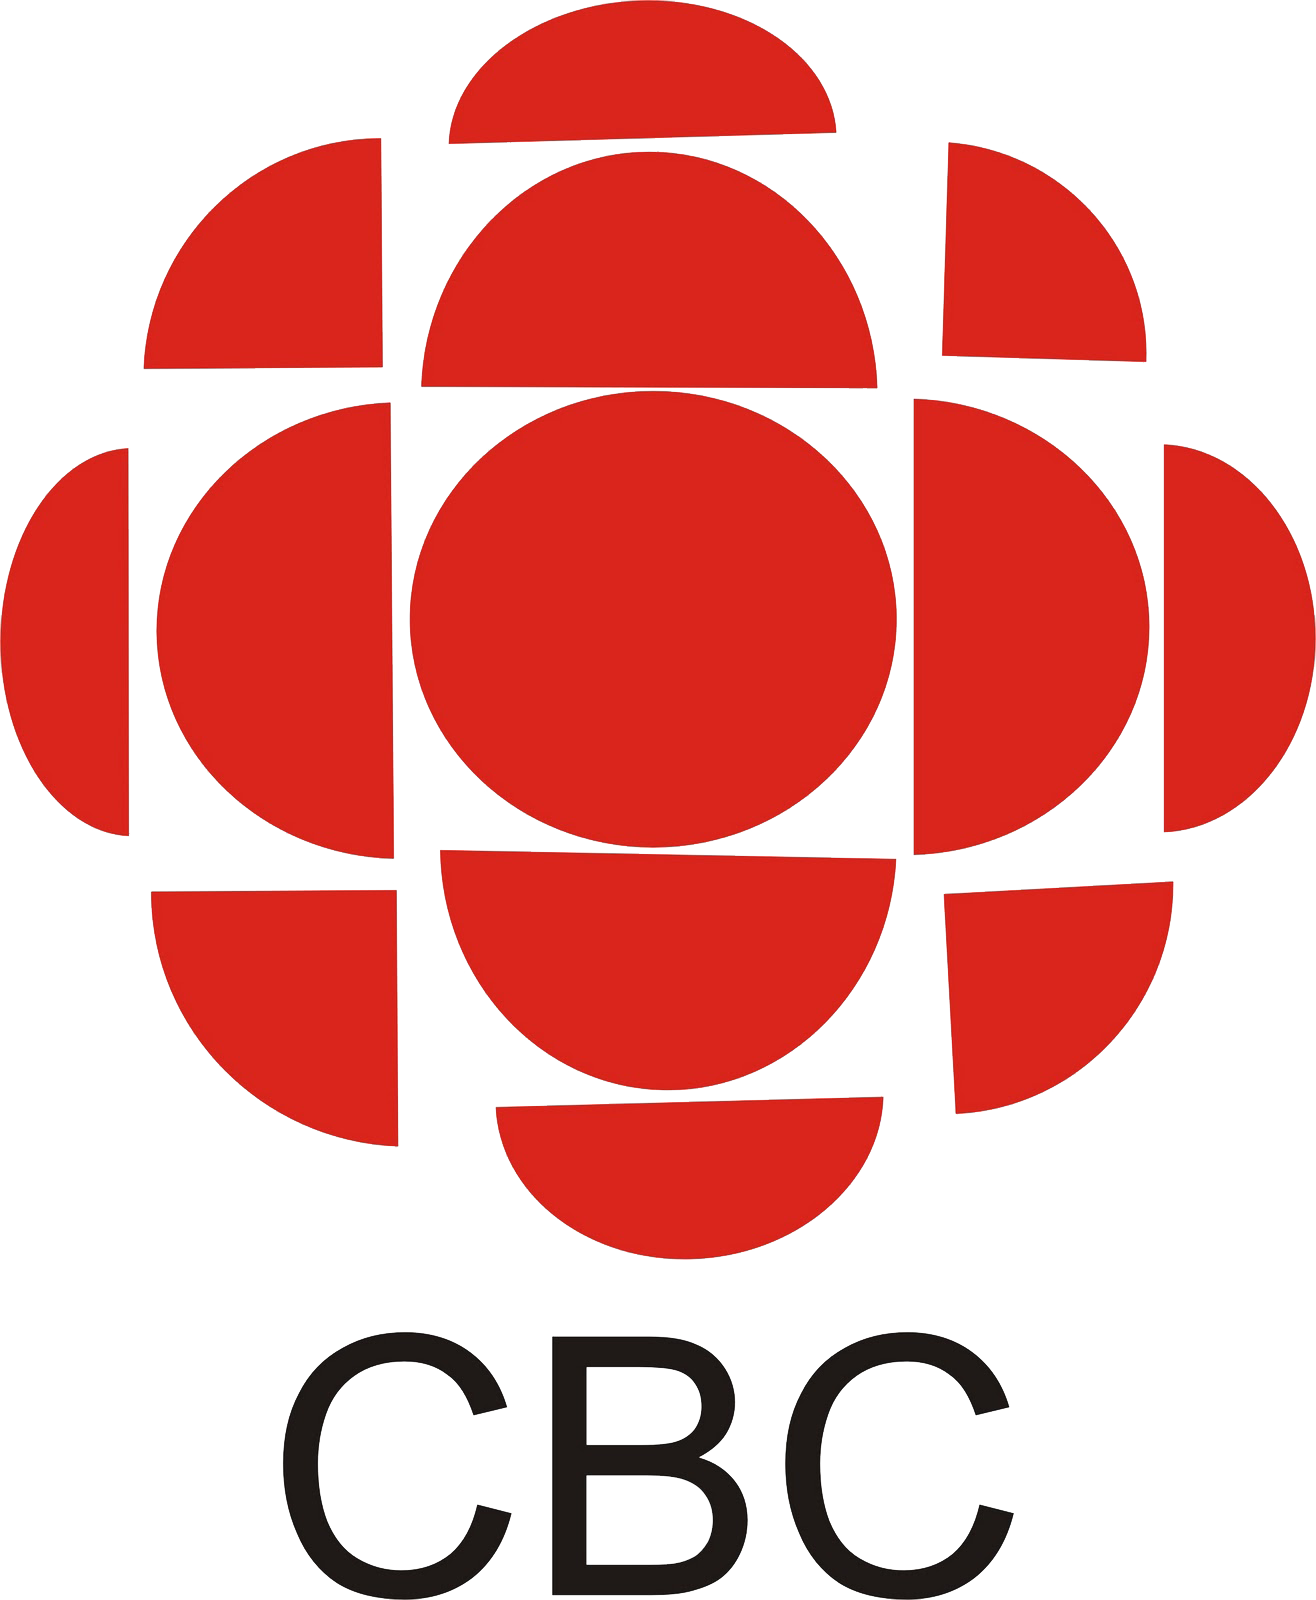 kisspng-canadian-broadcasting-centre-canadian-broadcasting-5b29d7a48ca2b1.1330479015294688365761.png